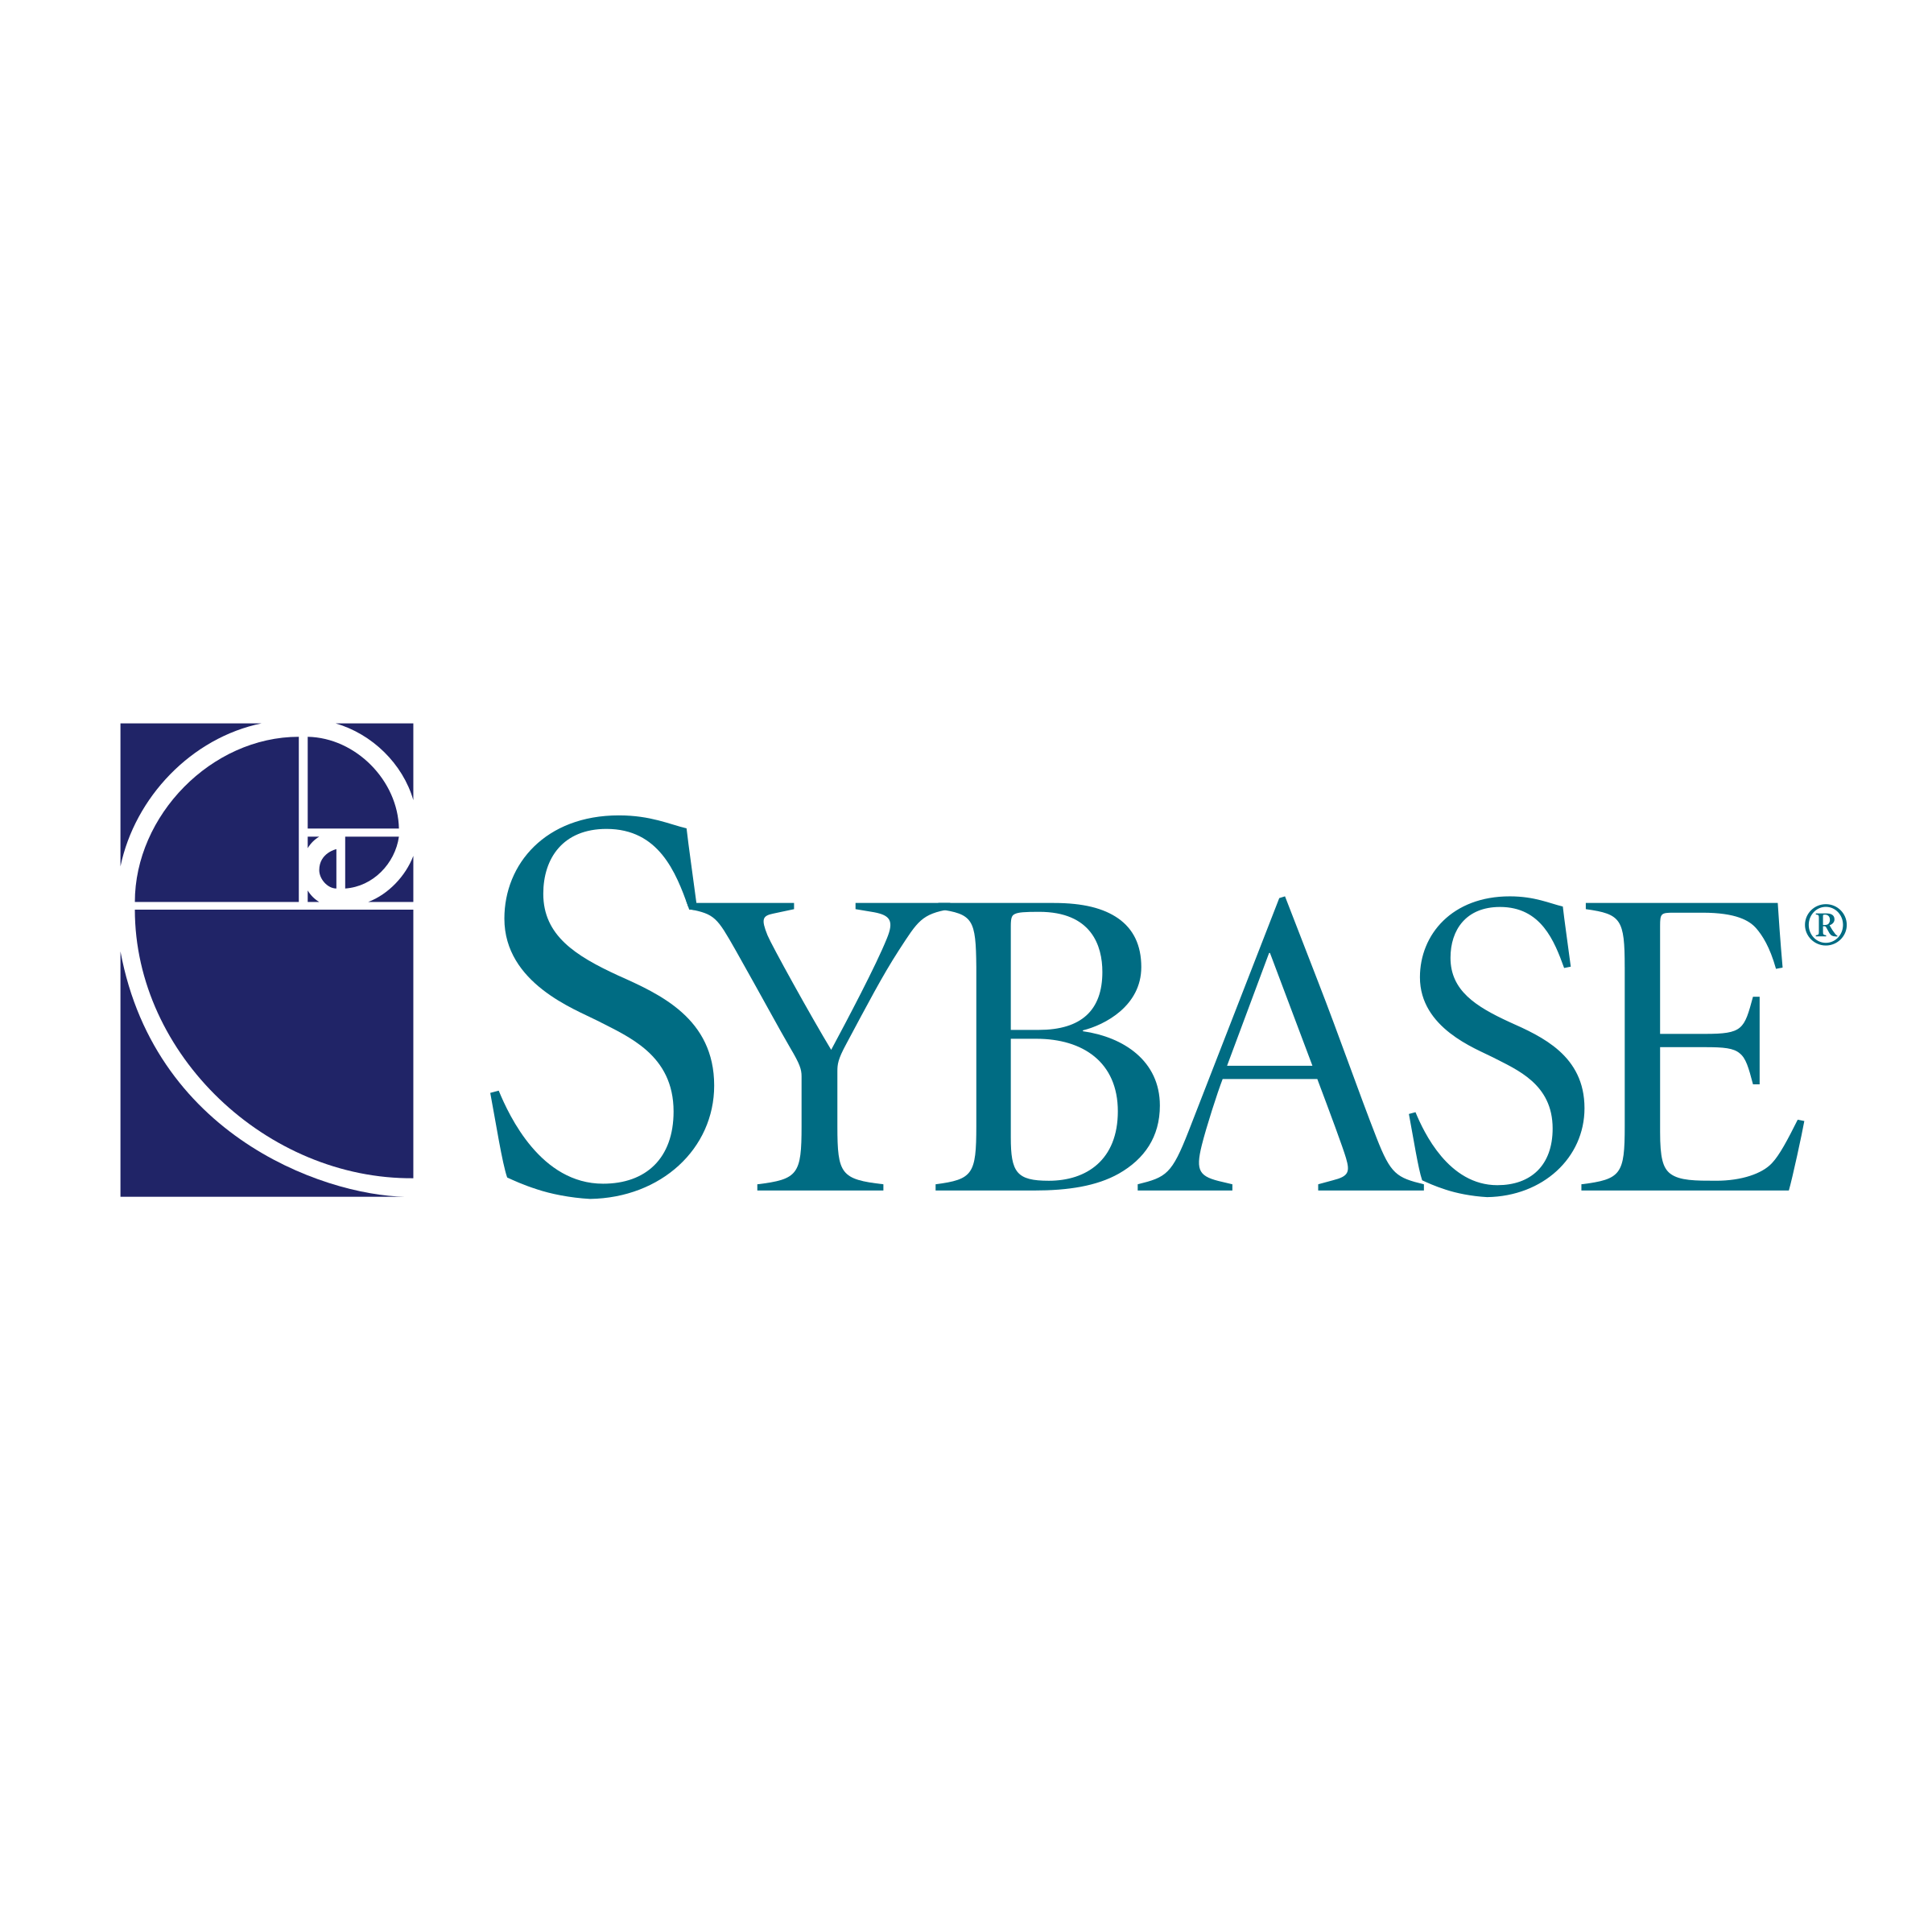 SyBase Logo PNG Transparent & SVG Vector - Freebie Supply